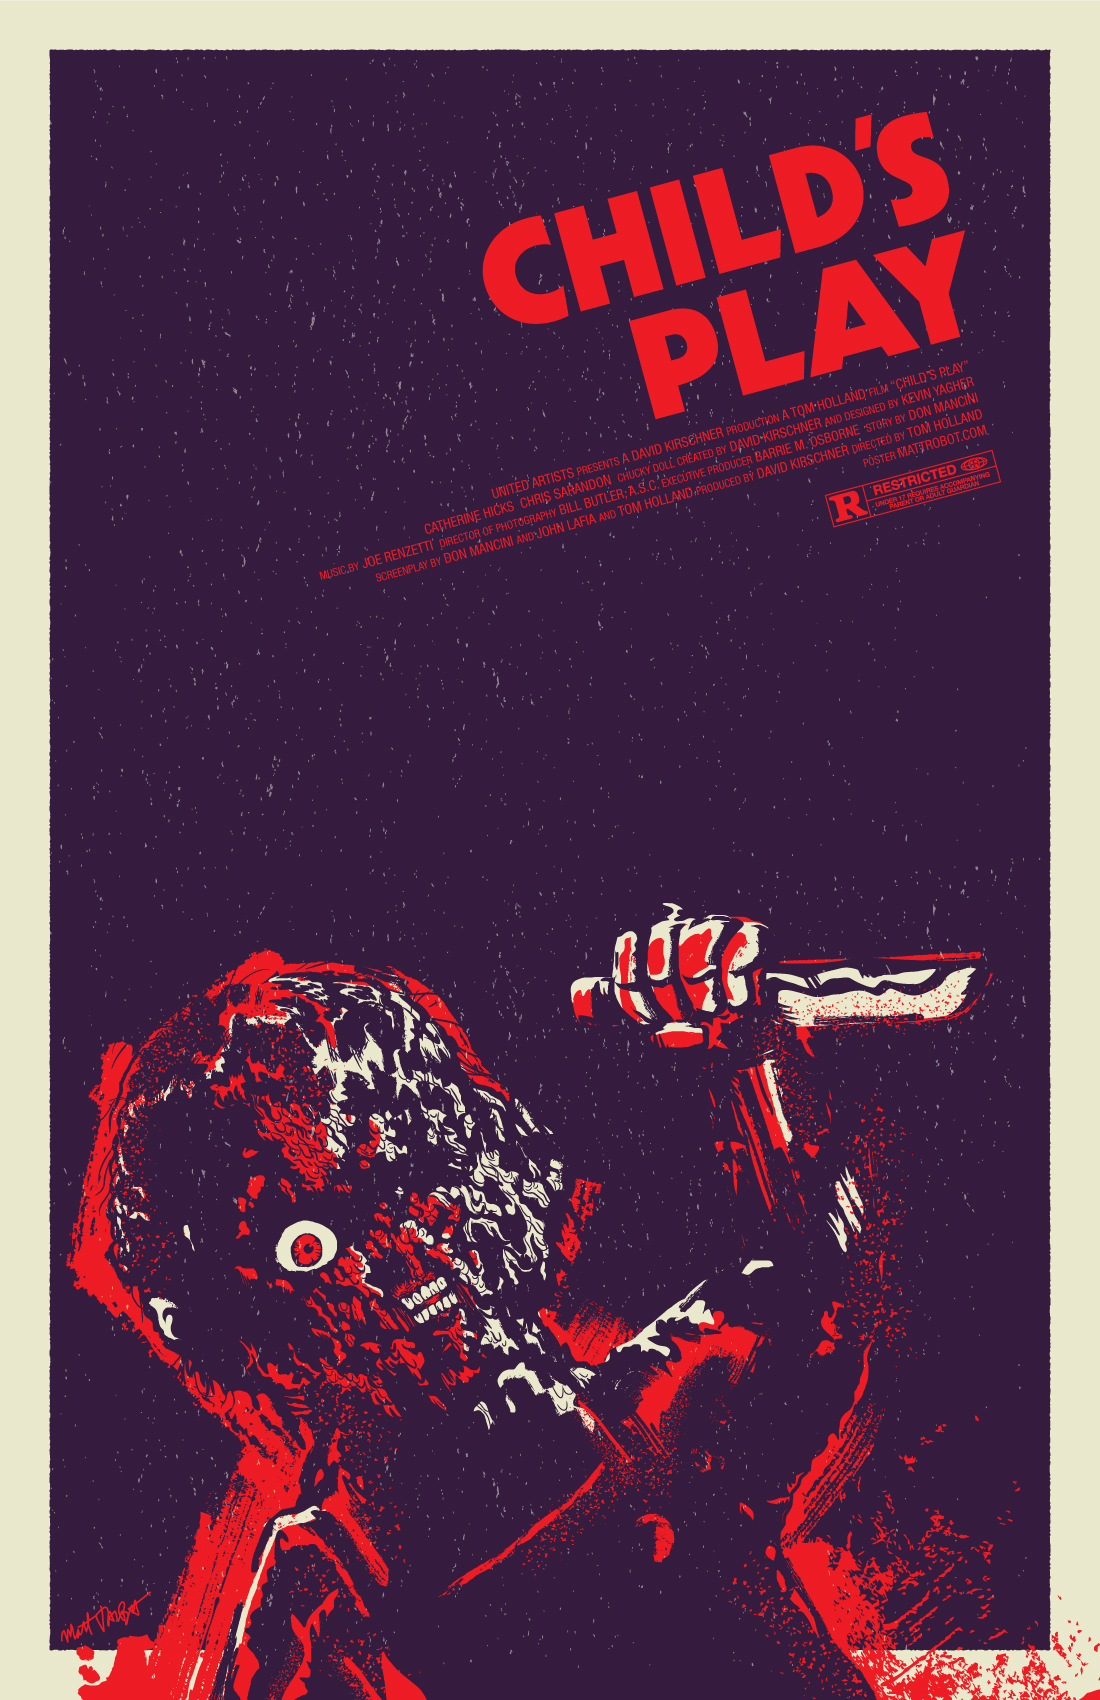 Child's Play Poster by Matt Talbot